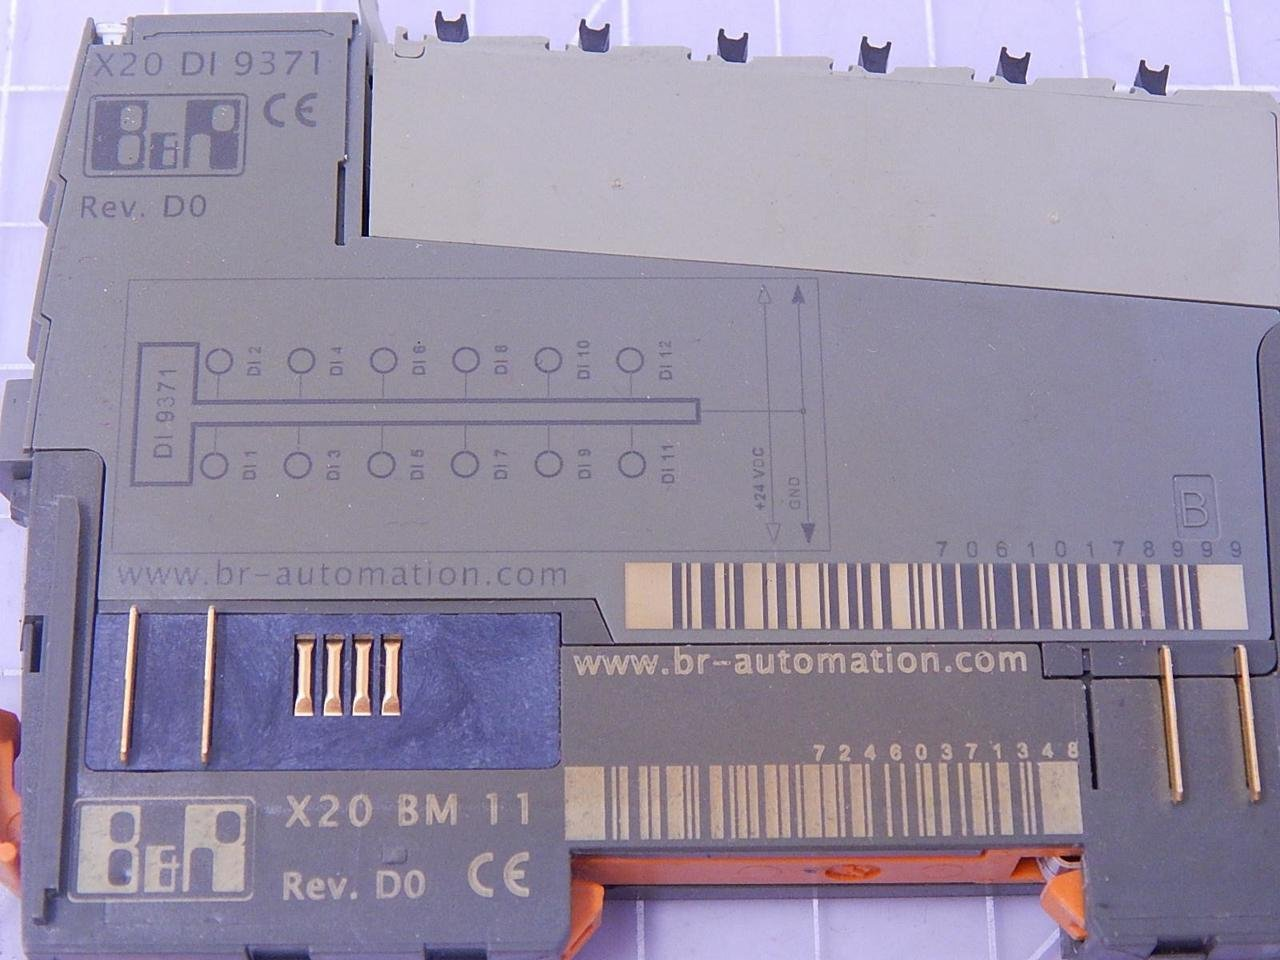 B/&r X20 BM 11 Module Bus 24 VDC Keyed interne I//O approvisionnement continu